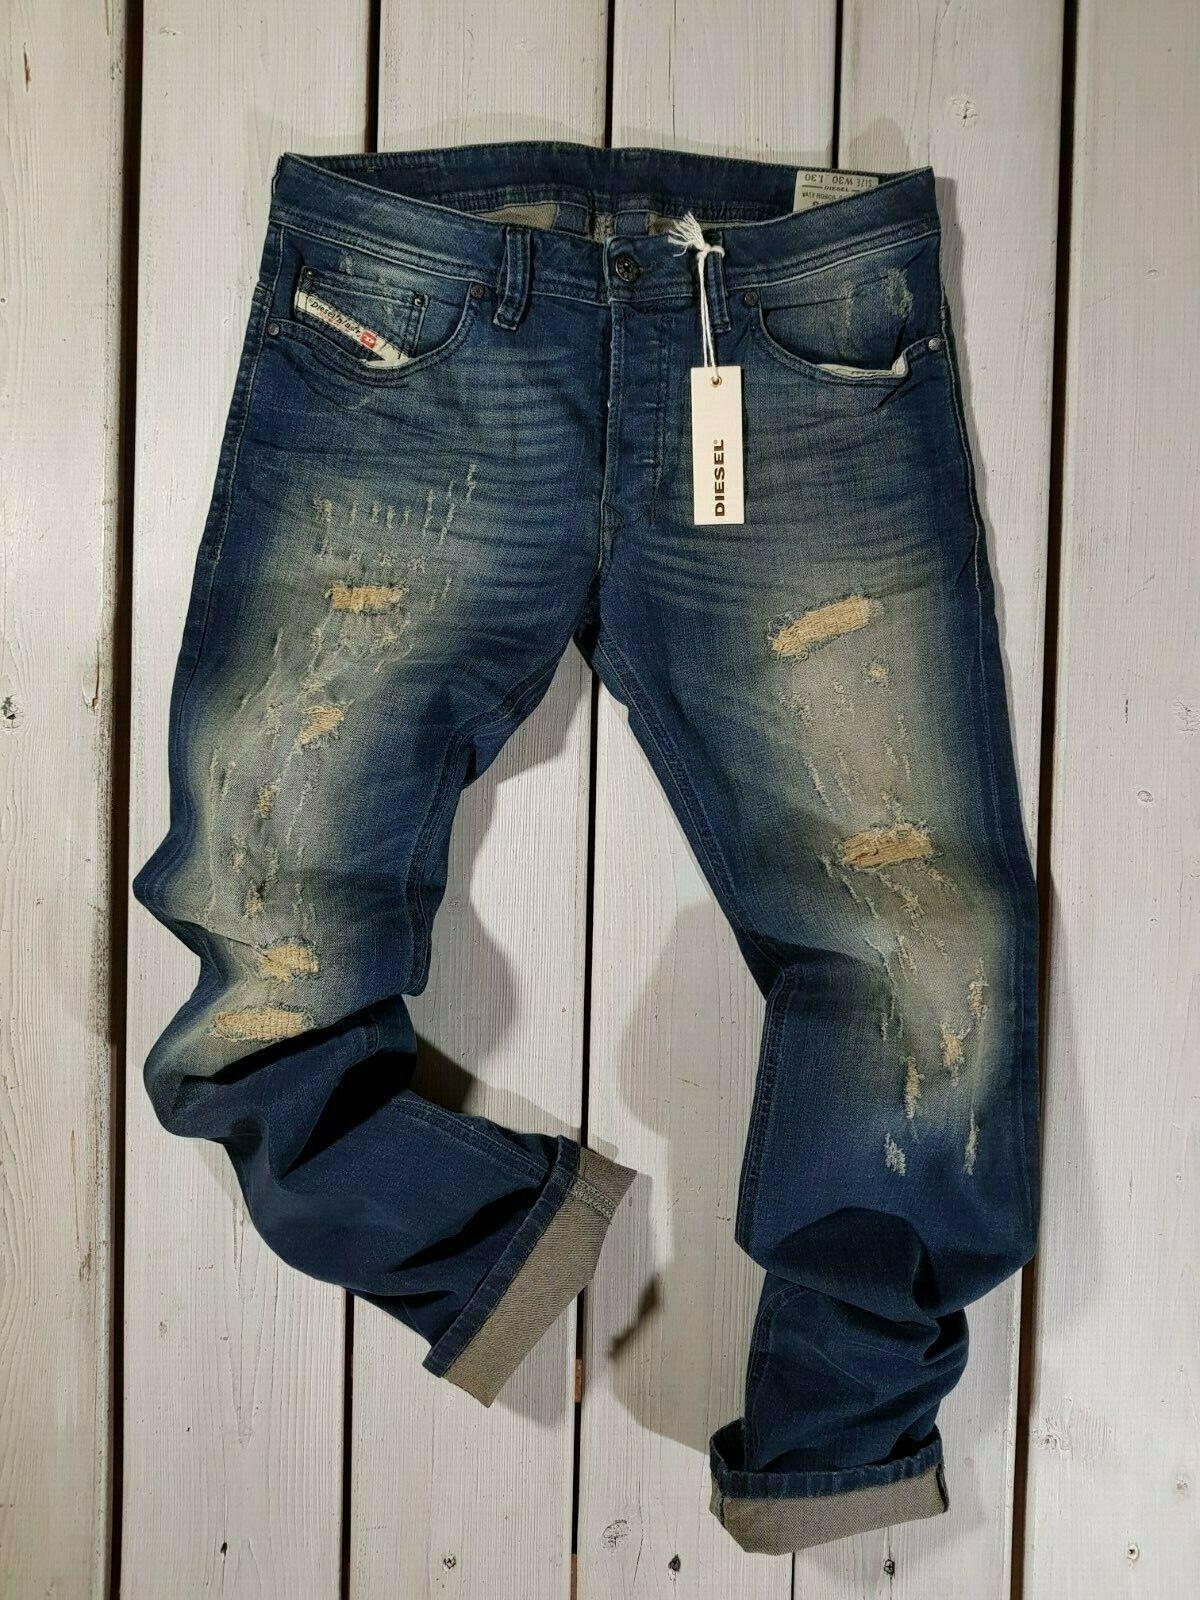 RRP  NEW DIESEL MEN'S JEANS SAFADO R08C6 REGULAR SLIM STRAIGHT STRETCH blueE